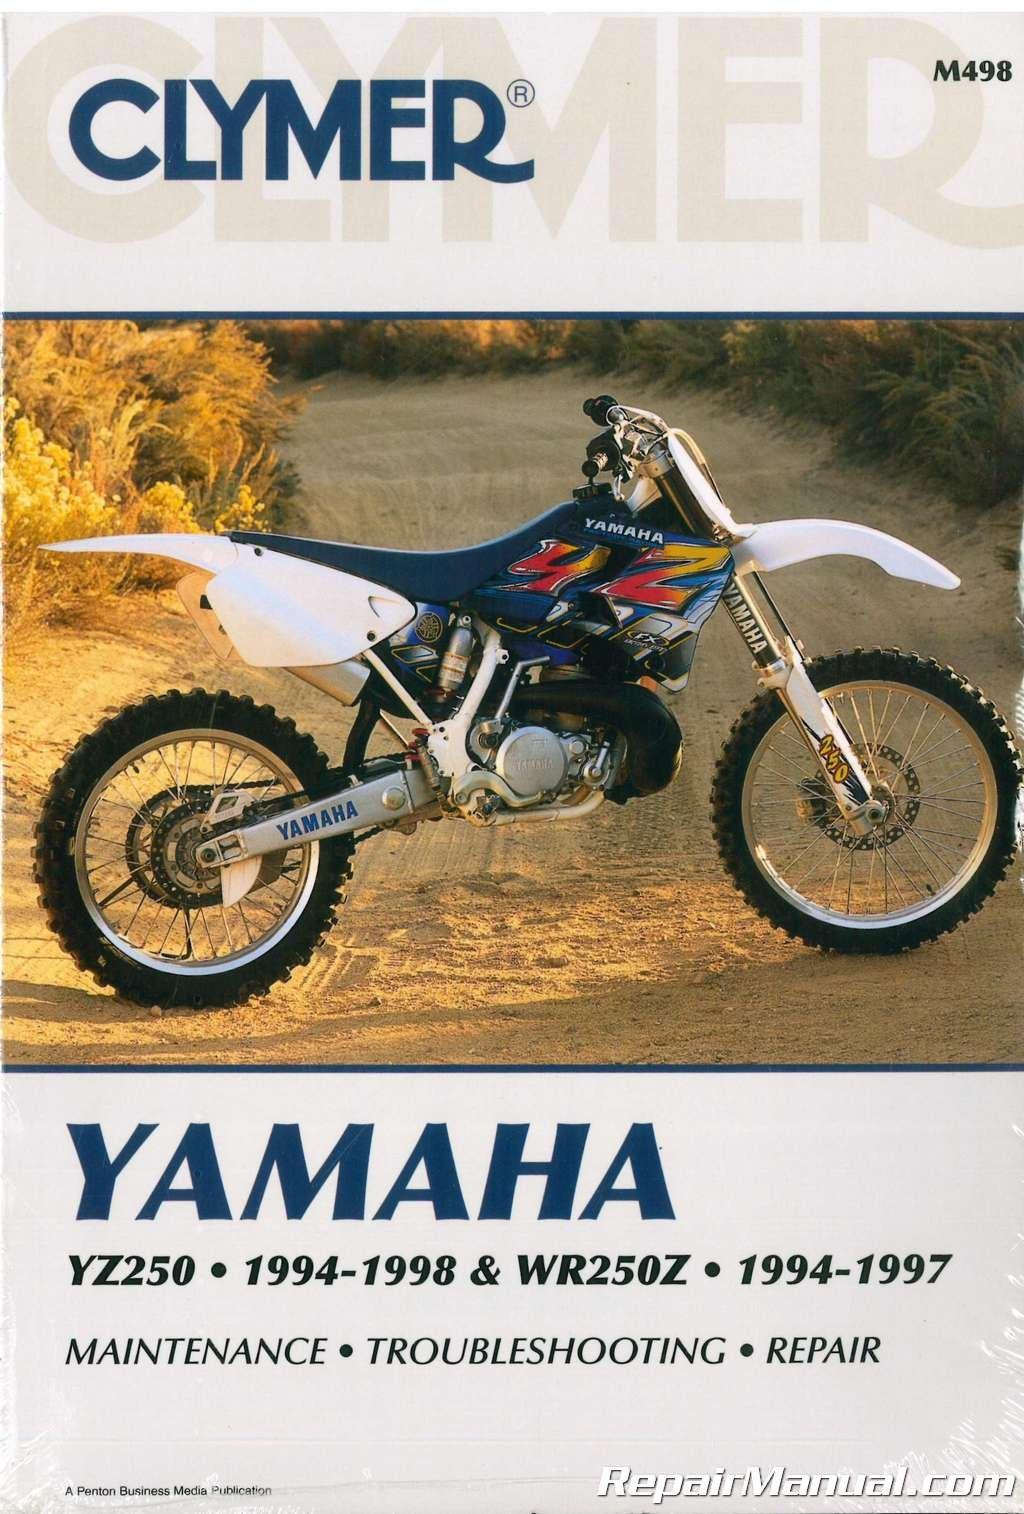 M498 Clymer Yamaha YZ250 1994-1998 WR250Z 1994-1997 Motorcycle Repair Manual:  Manufacturer